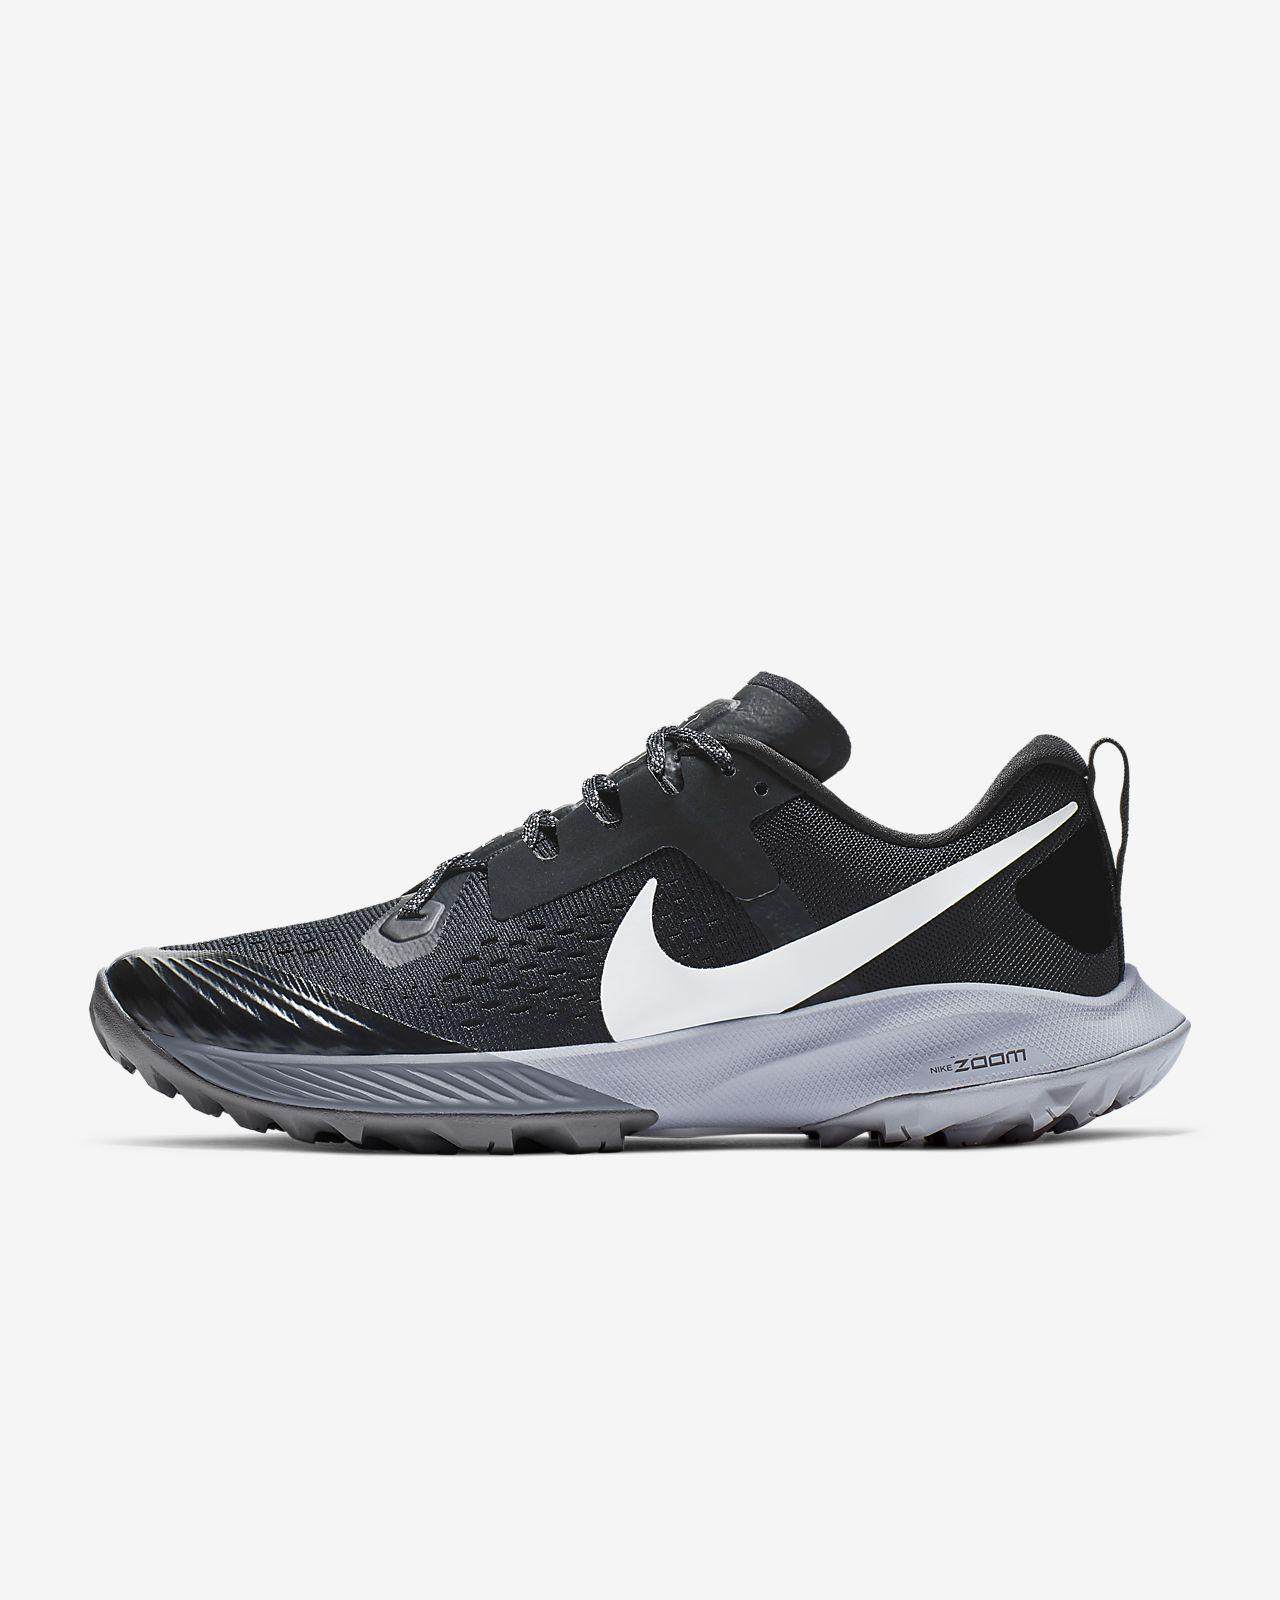 Sapatilhas de running para trilhos Nike Air Zoom Terra Kiger 5 para mulher